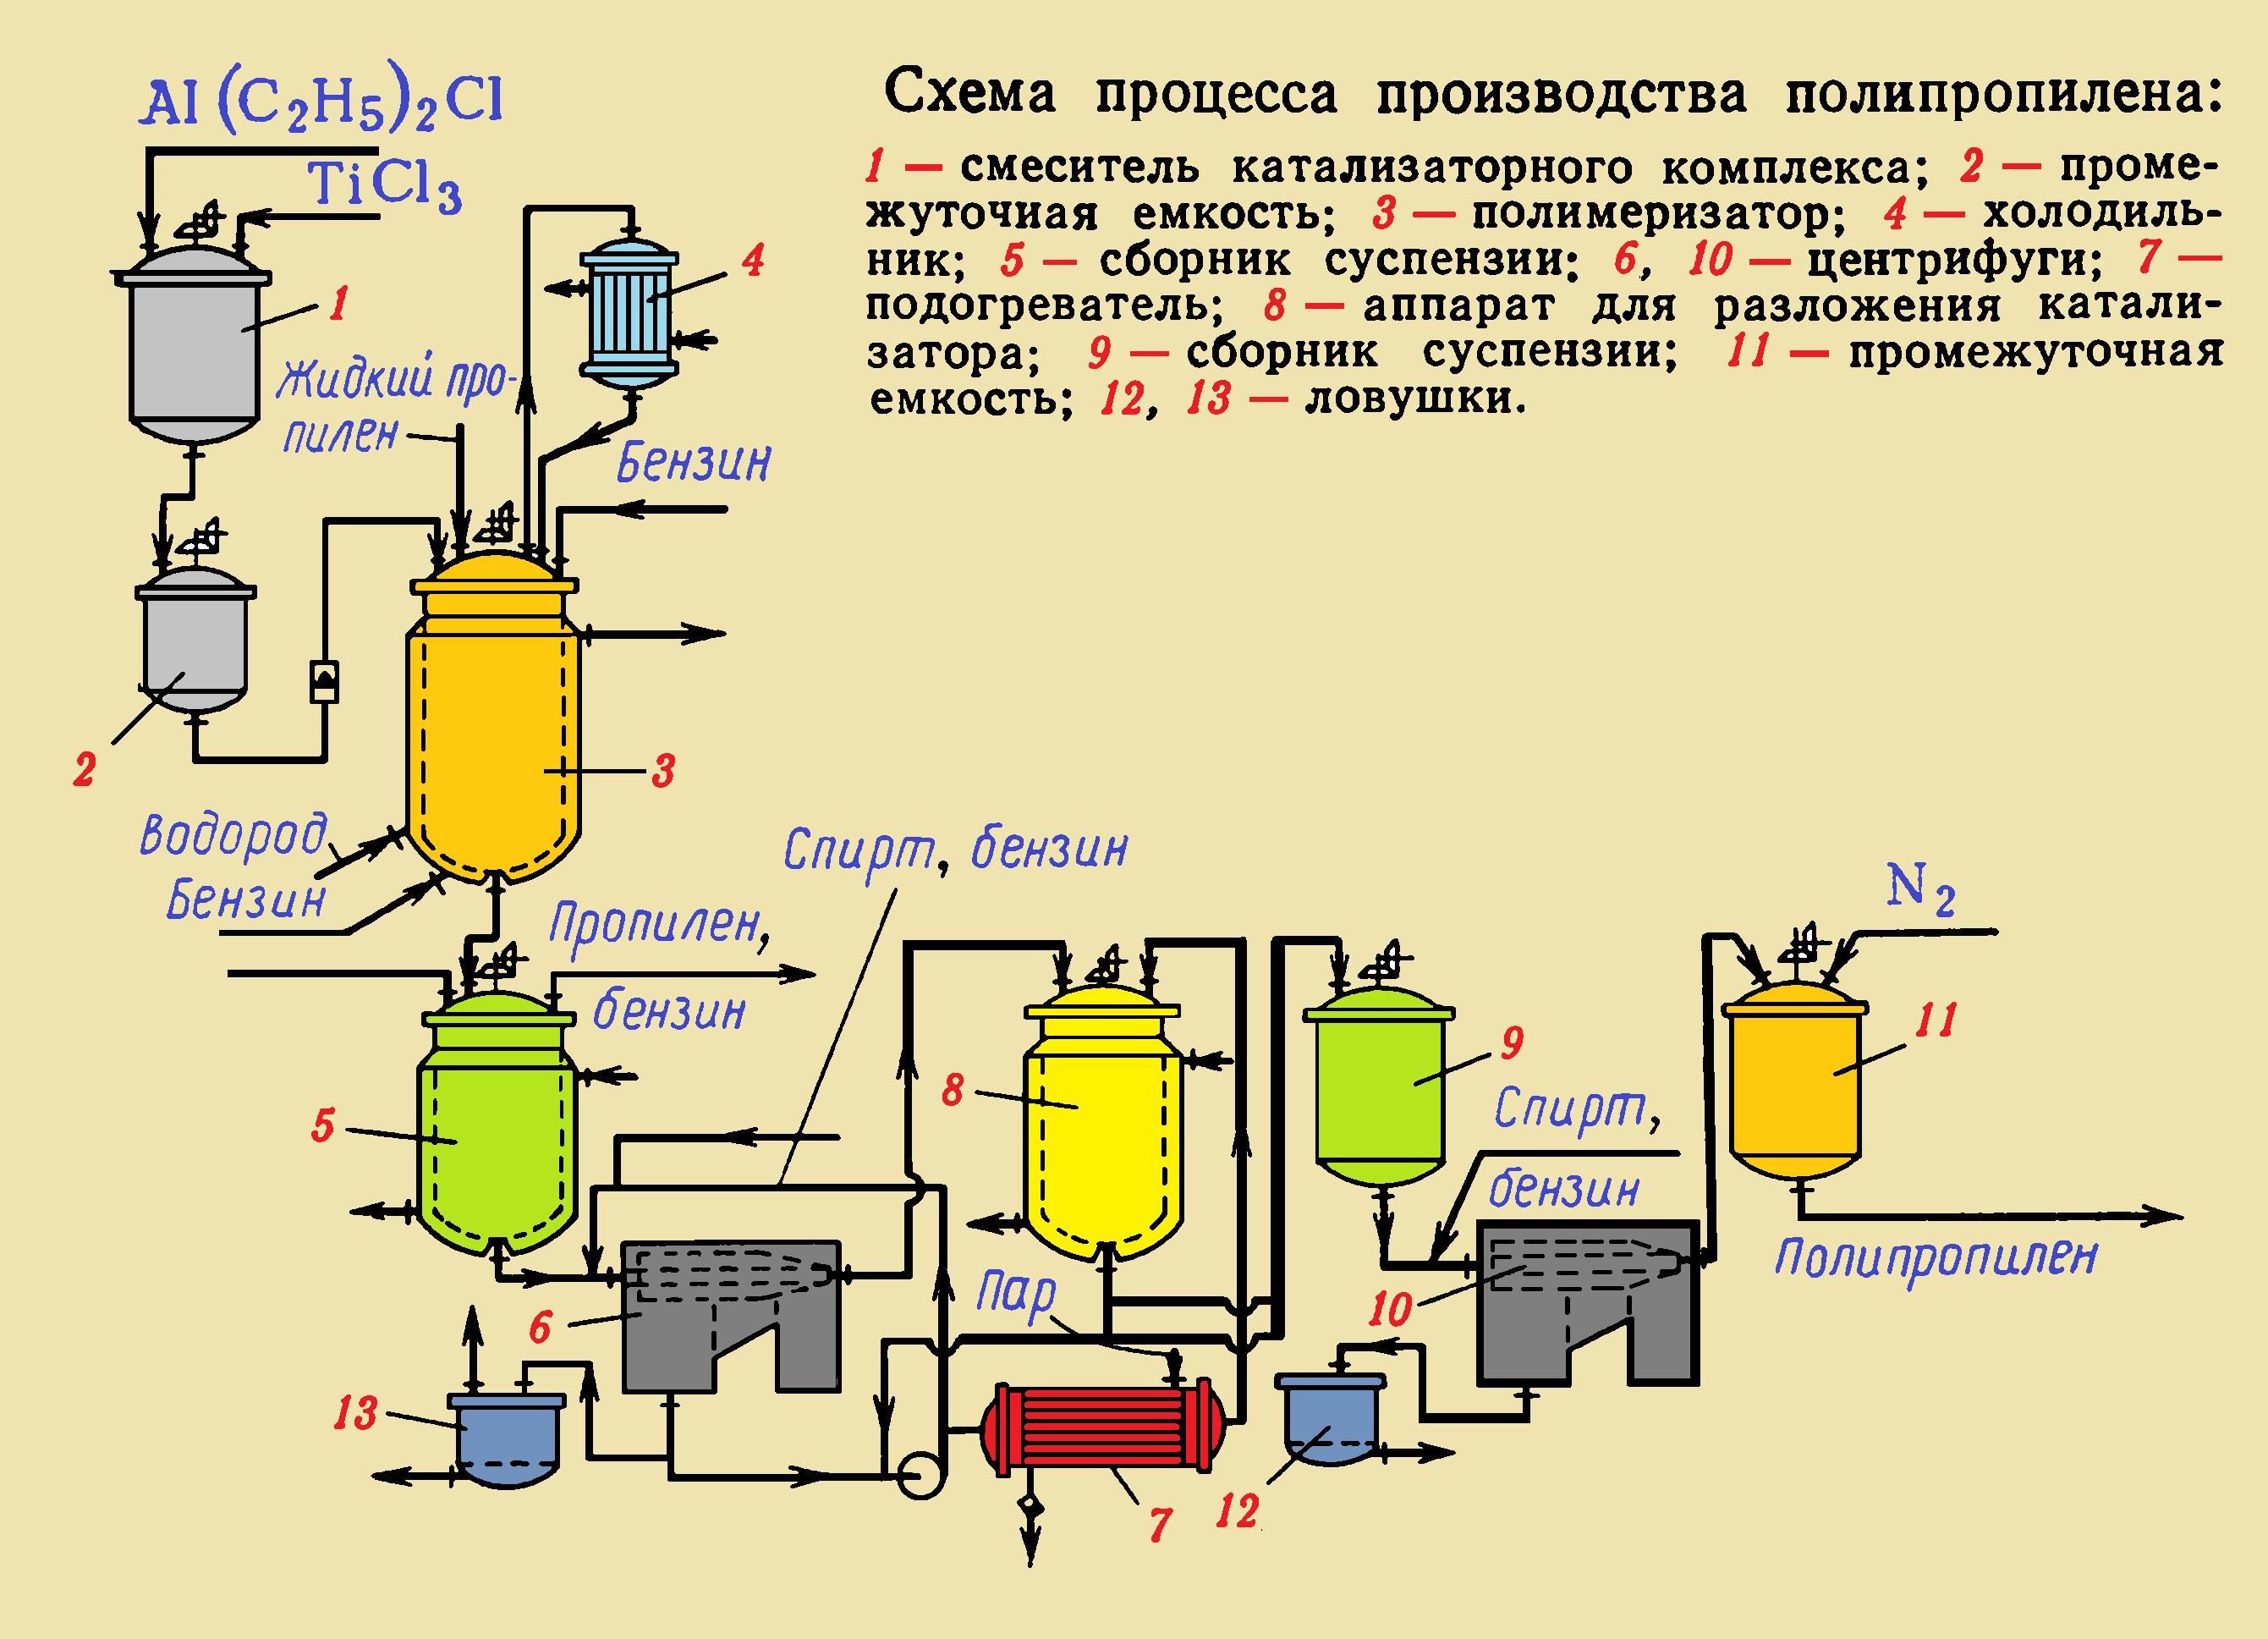 схема производства полипропилена